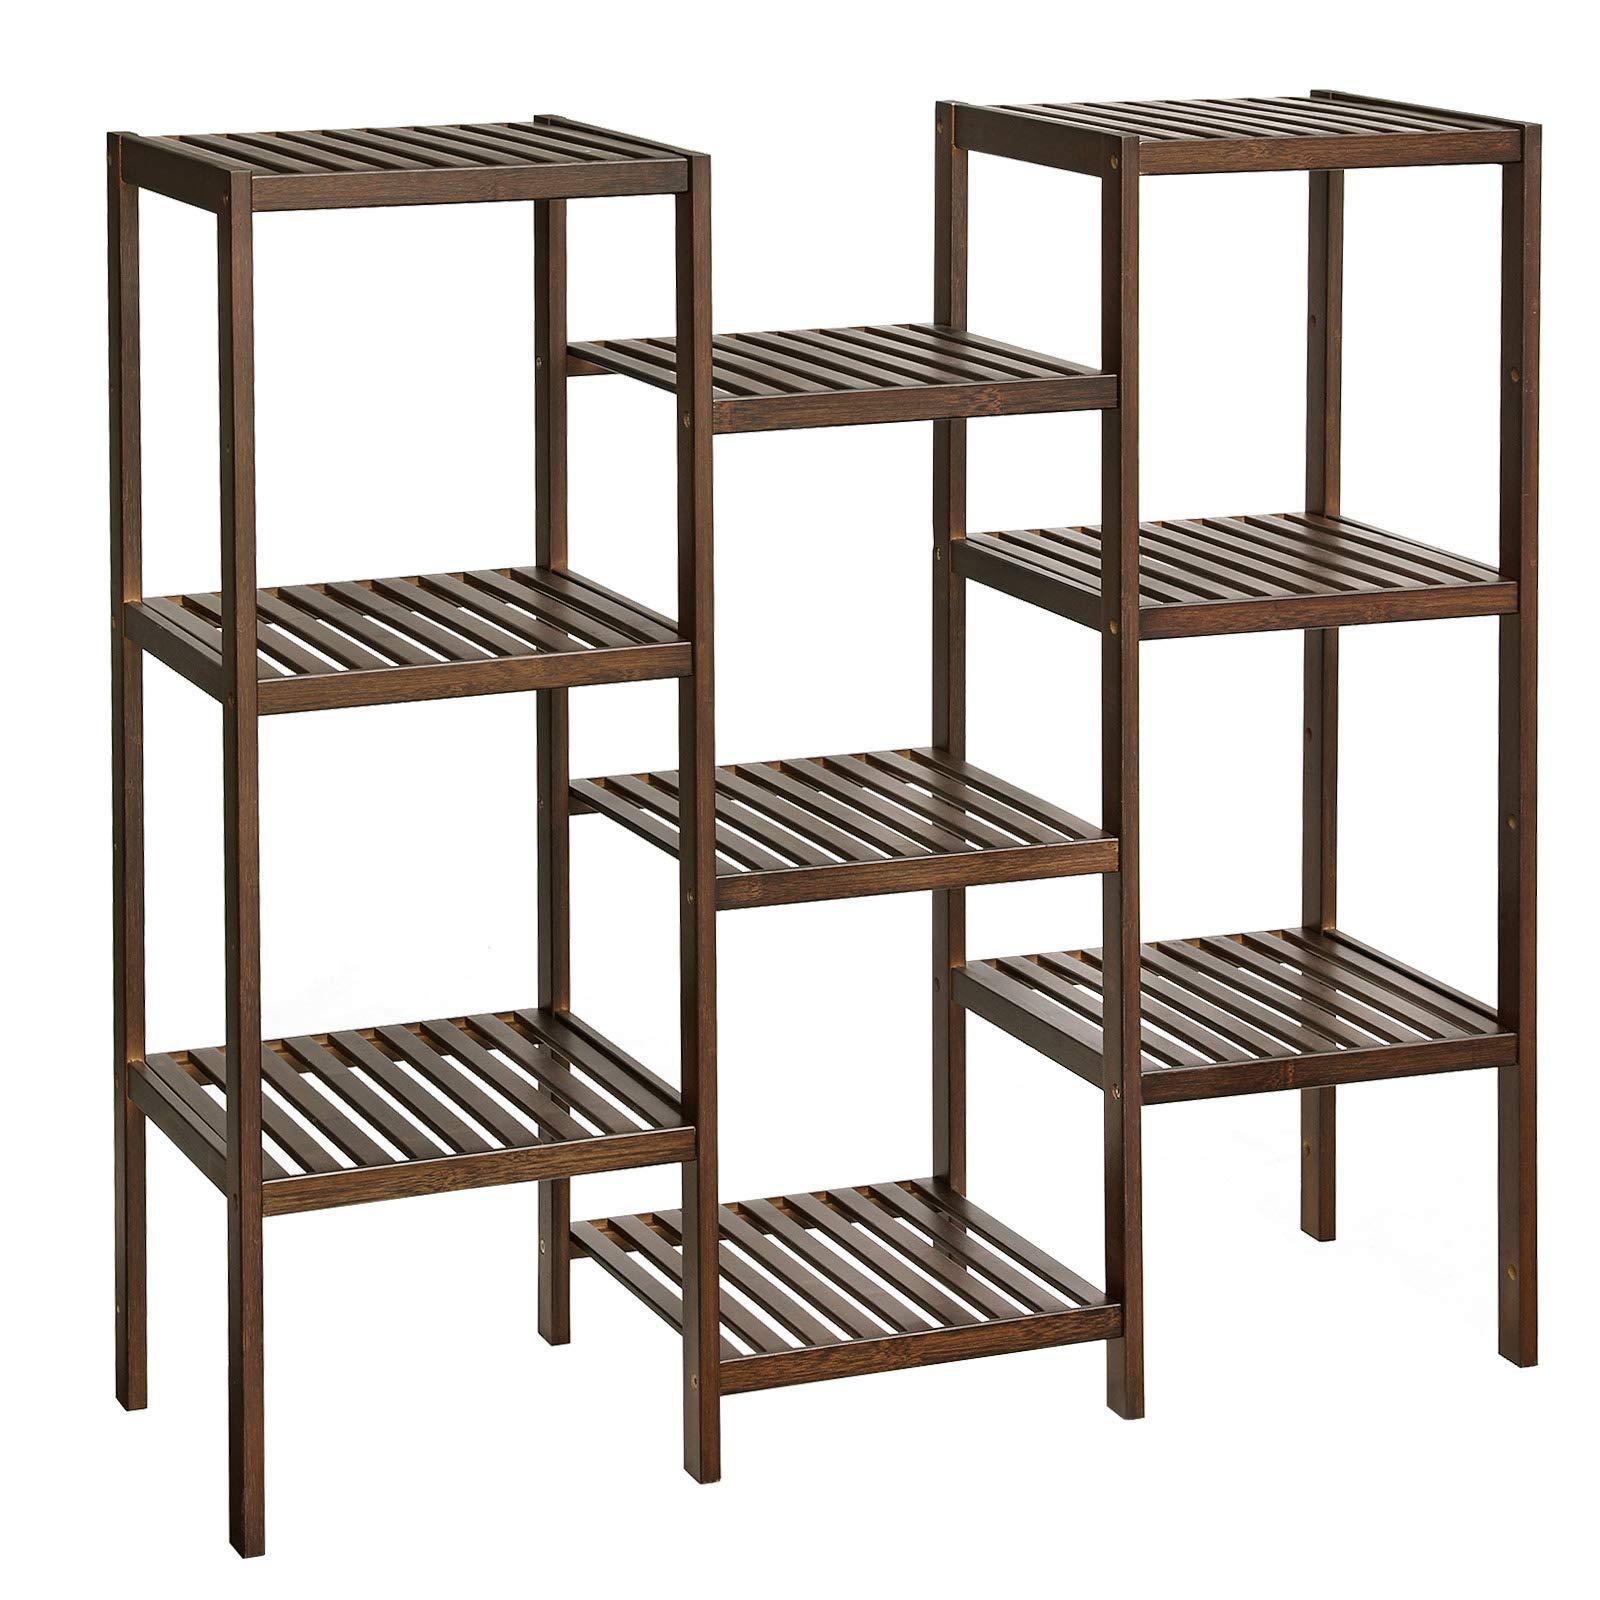 SONGMICS Bamboo Plant Stand, Bathroom Storage Rack, Customizable Flower Pots Holder, Multi-Purpose Display Rack, for Living Room, Balcony, Walnut Color UBCB93WL by SONGMICS